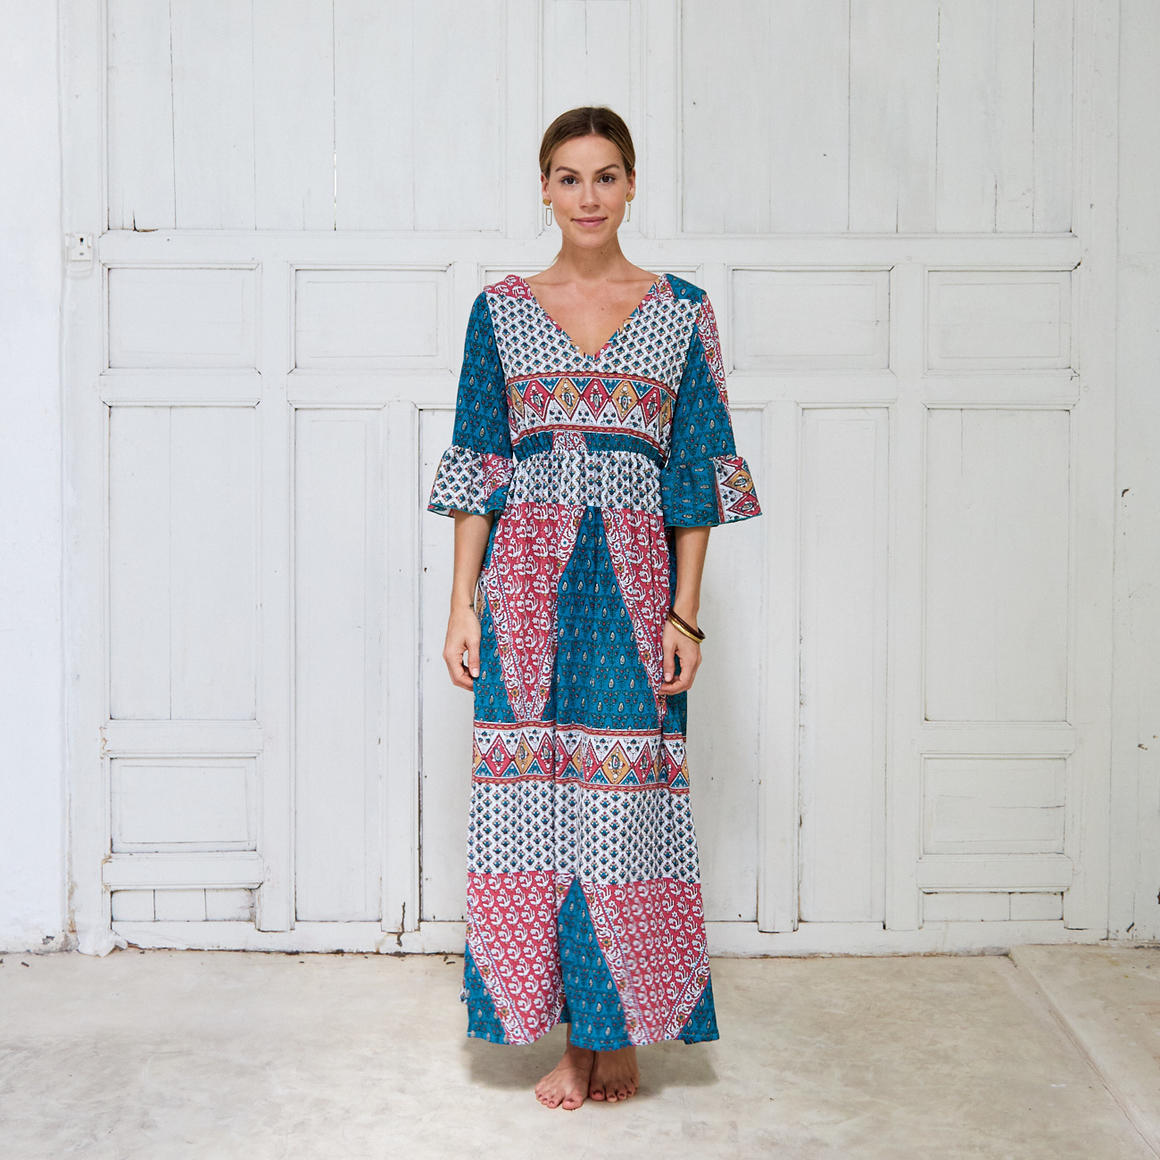 Turquoise empire dress - 2 pack | Trada Marketplace